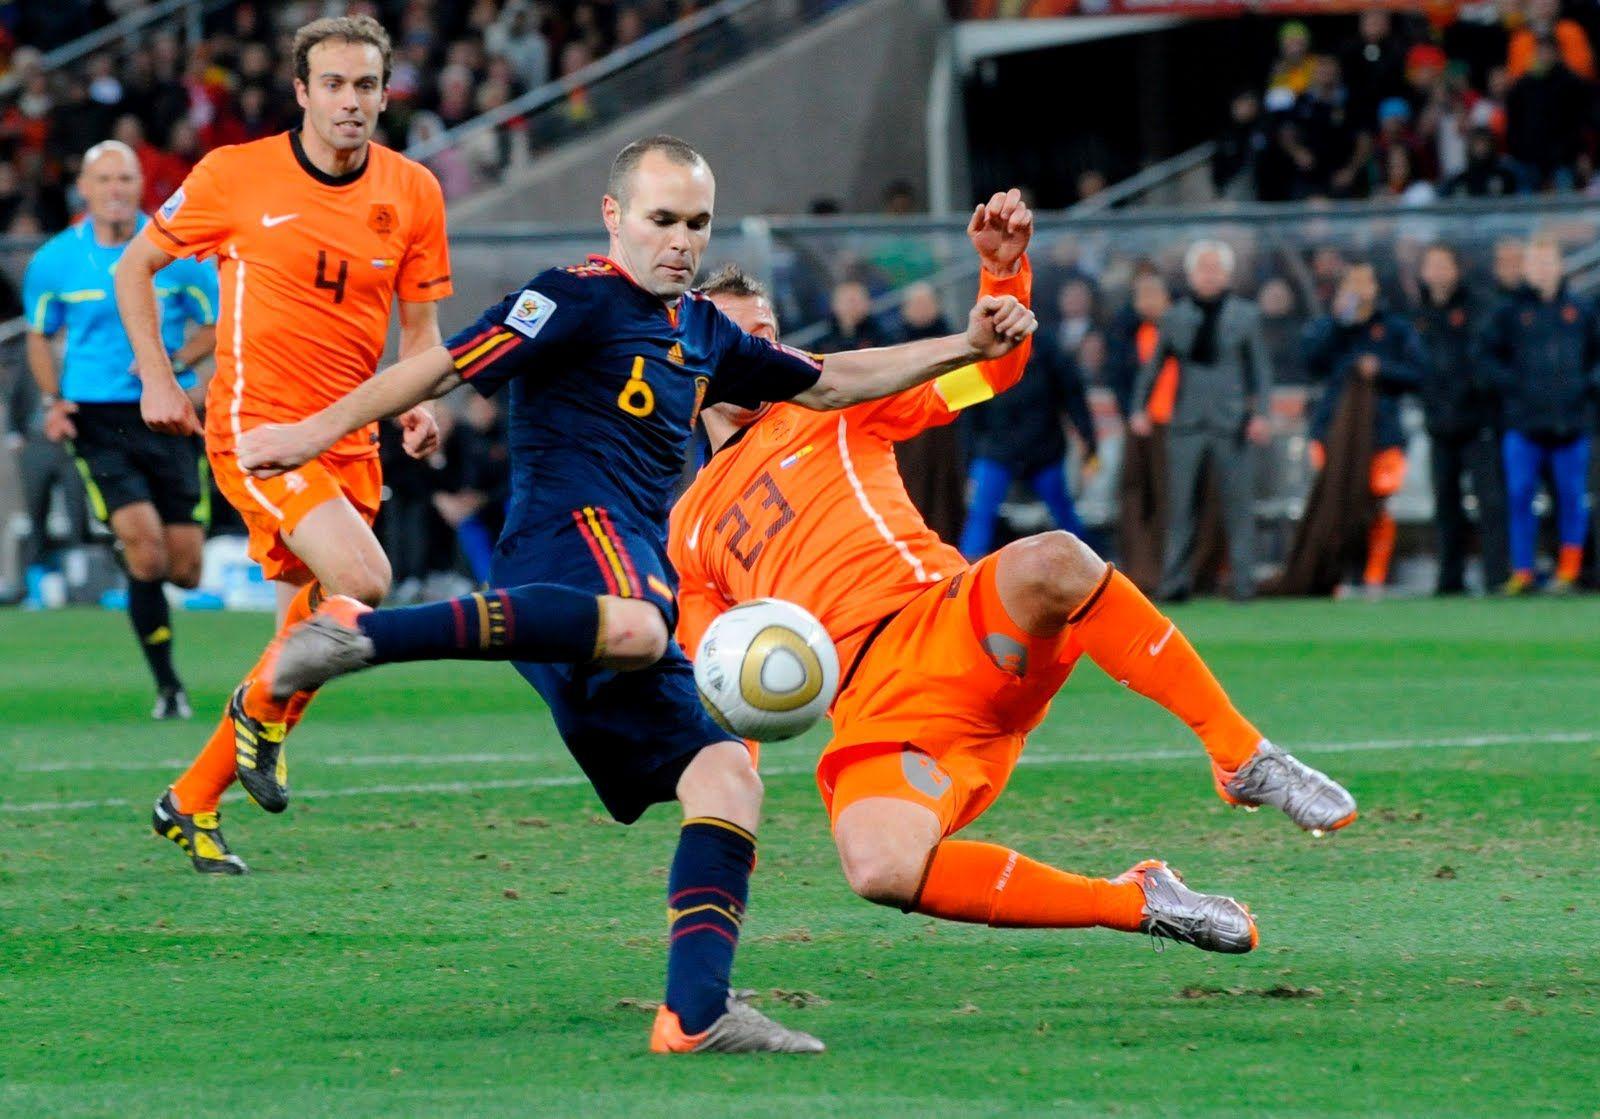 Piden perdón a Andrés Iniesta por no darle Balón de Oro 0